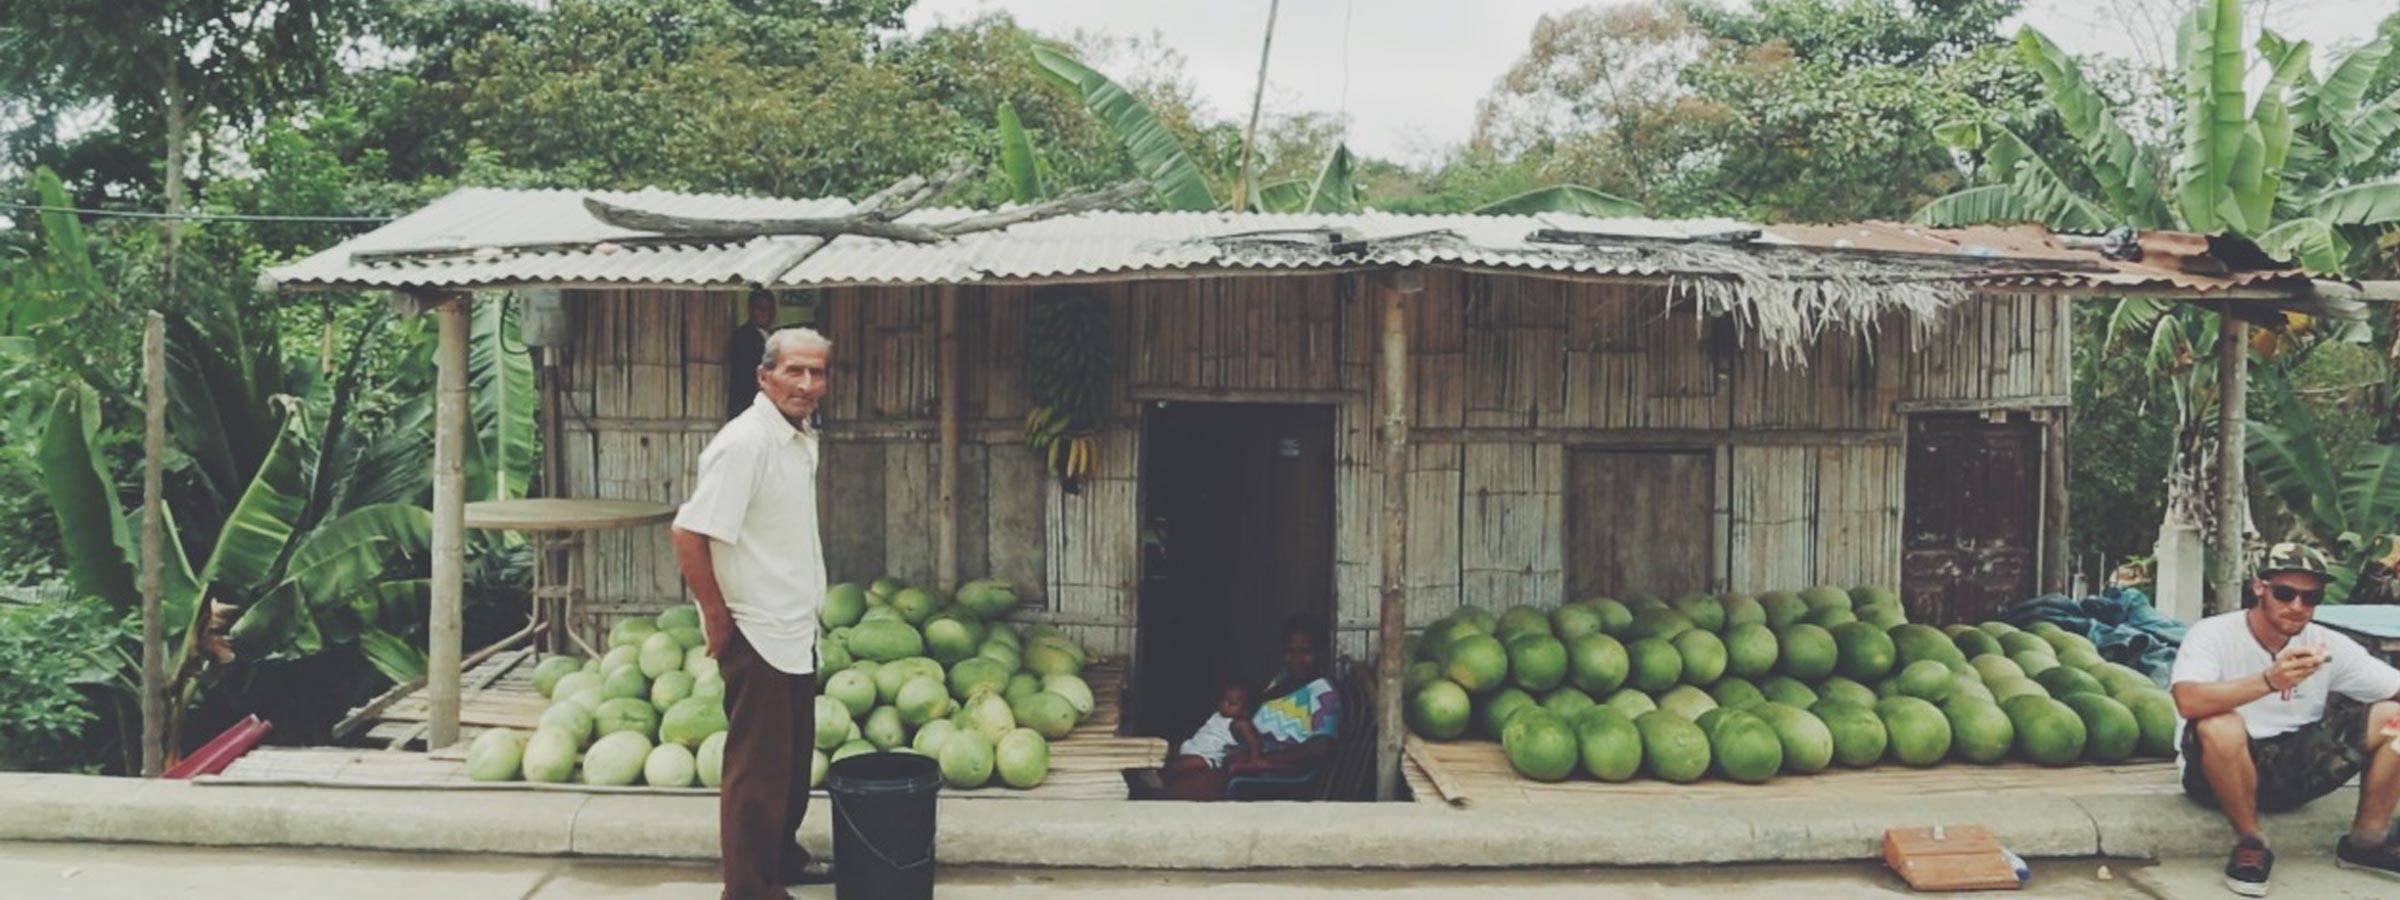 Nicoloas Picard Social Responsability -Watermelon